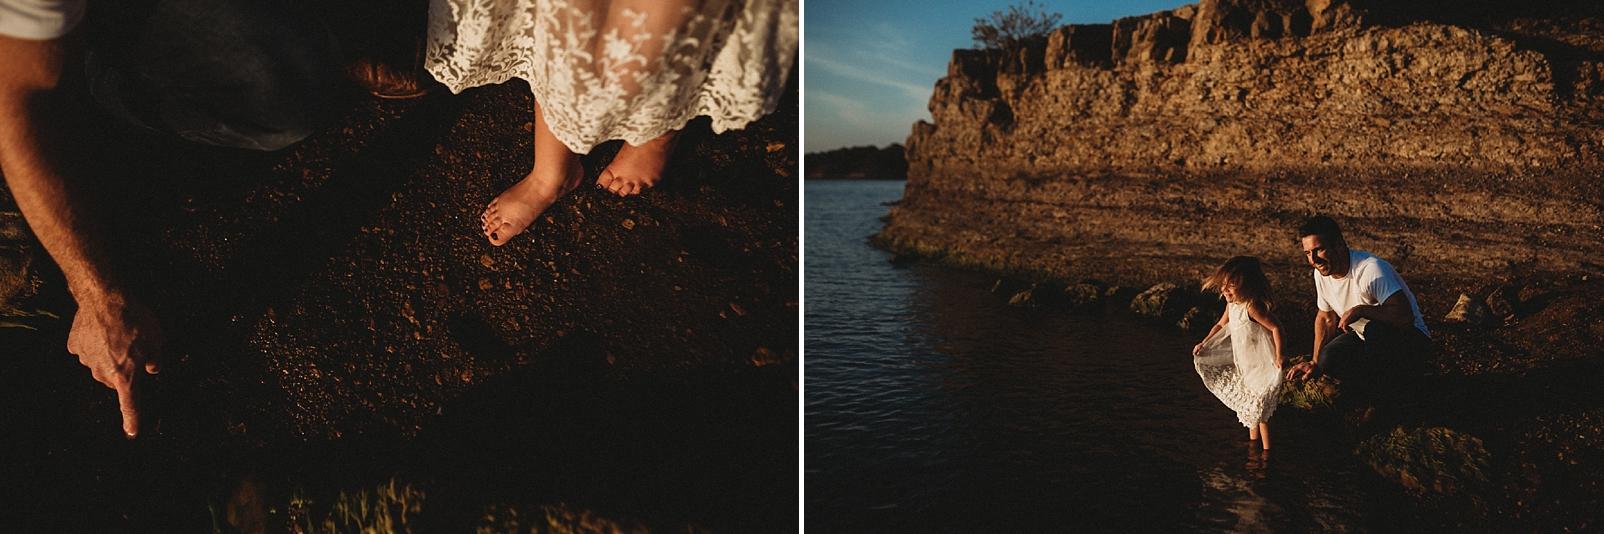 twyla jones photography - www.twylajones.com - sunset family maternity photoshoot dallas texas lake-TDJ_9788.jpg